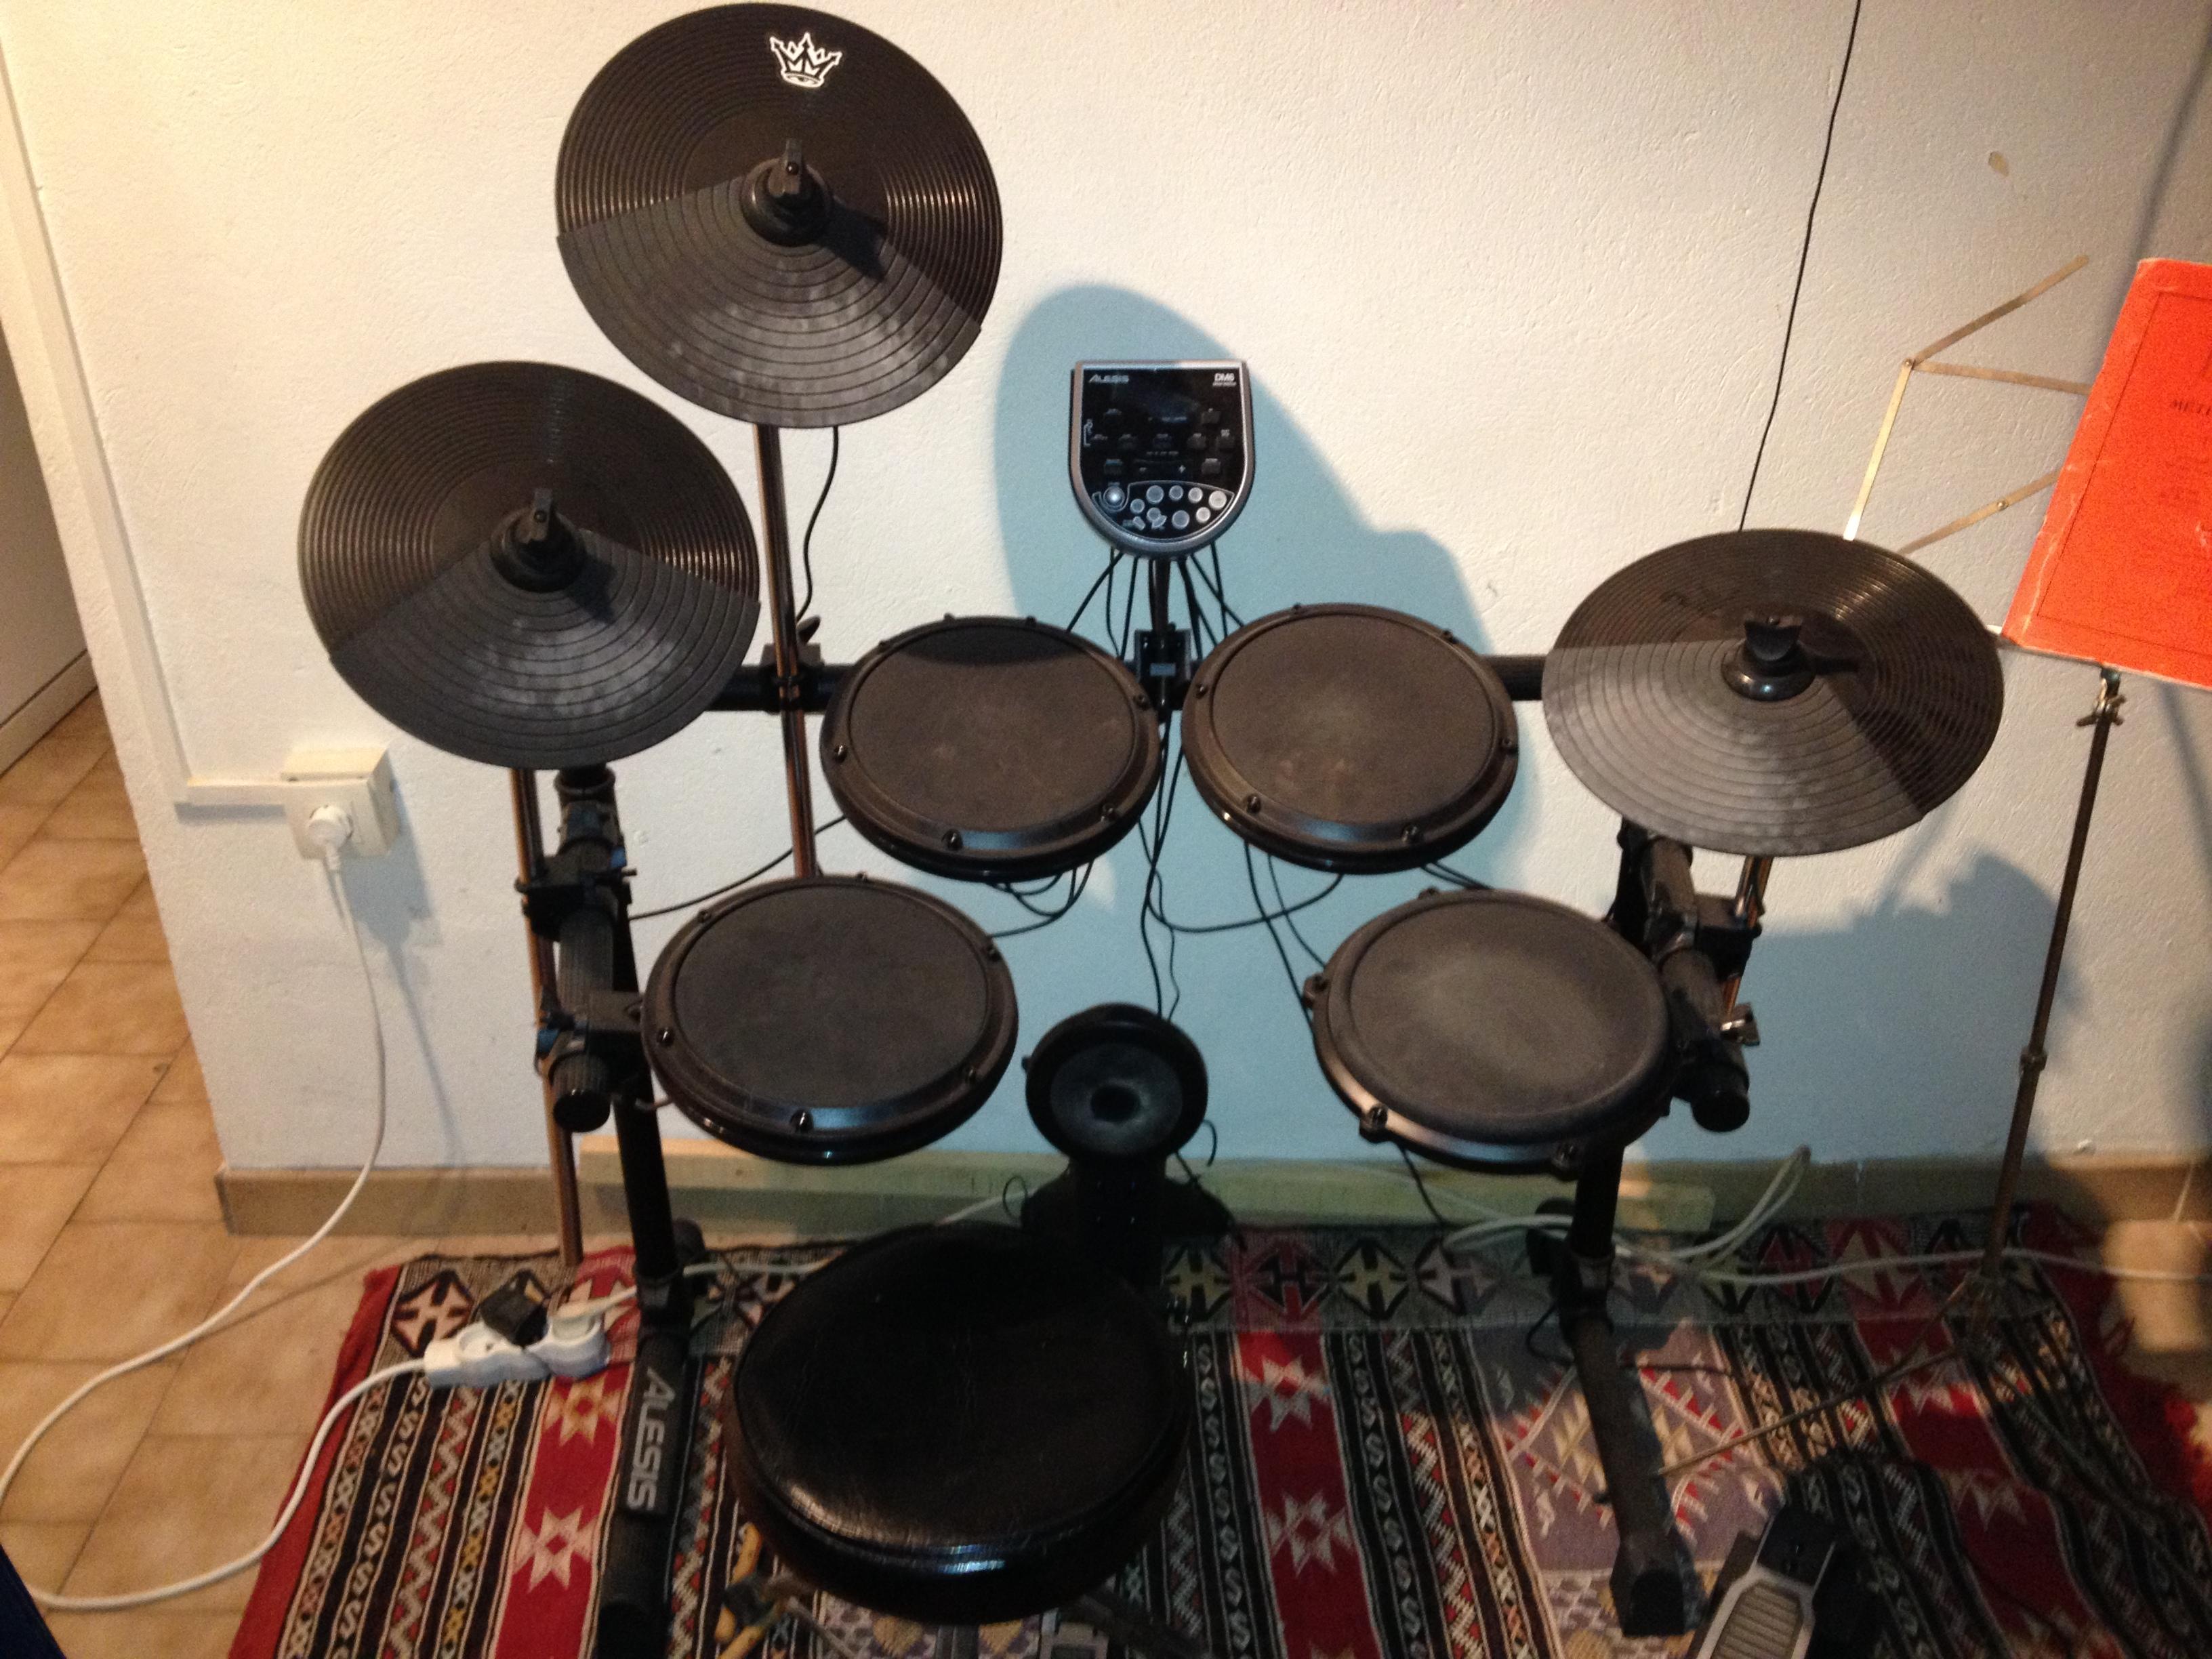 Alesis Dm6 Electronic Drum Set – HD Wallpapers